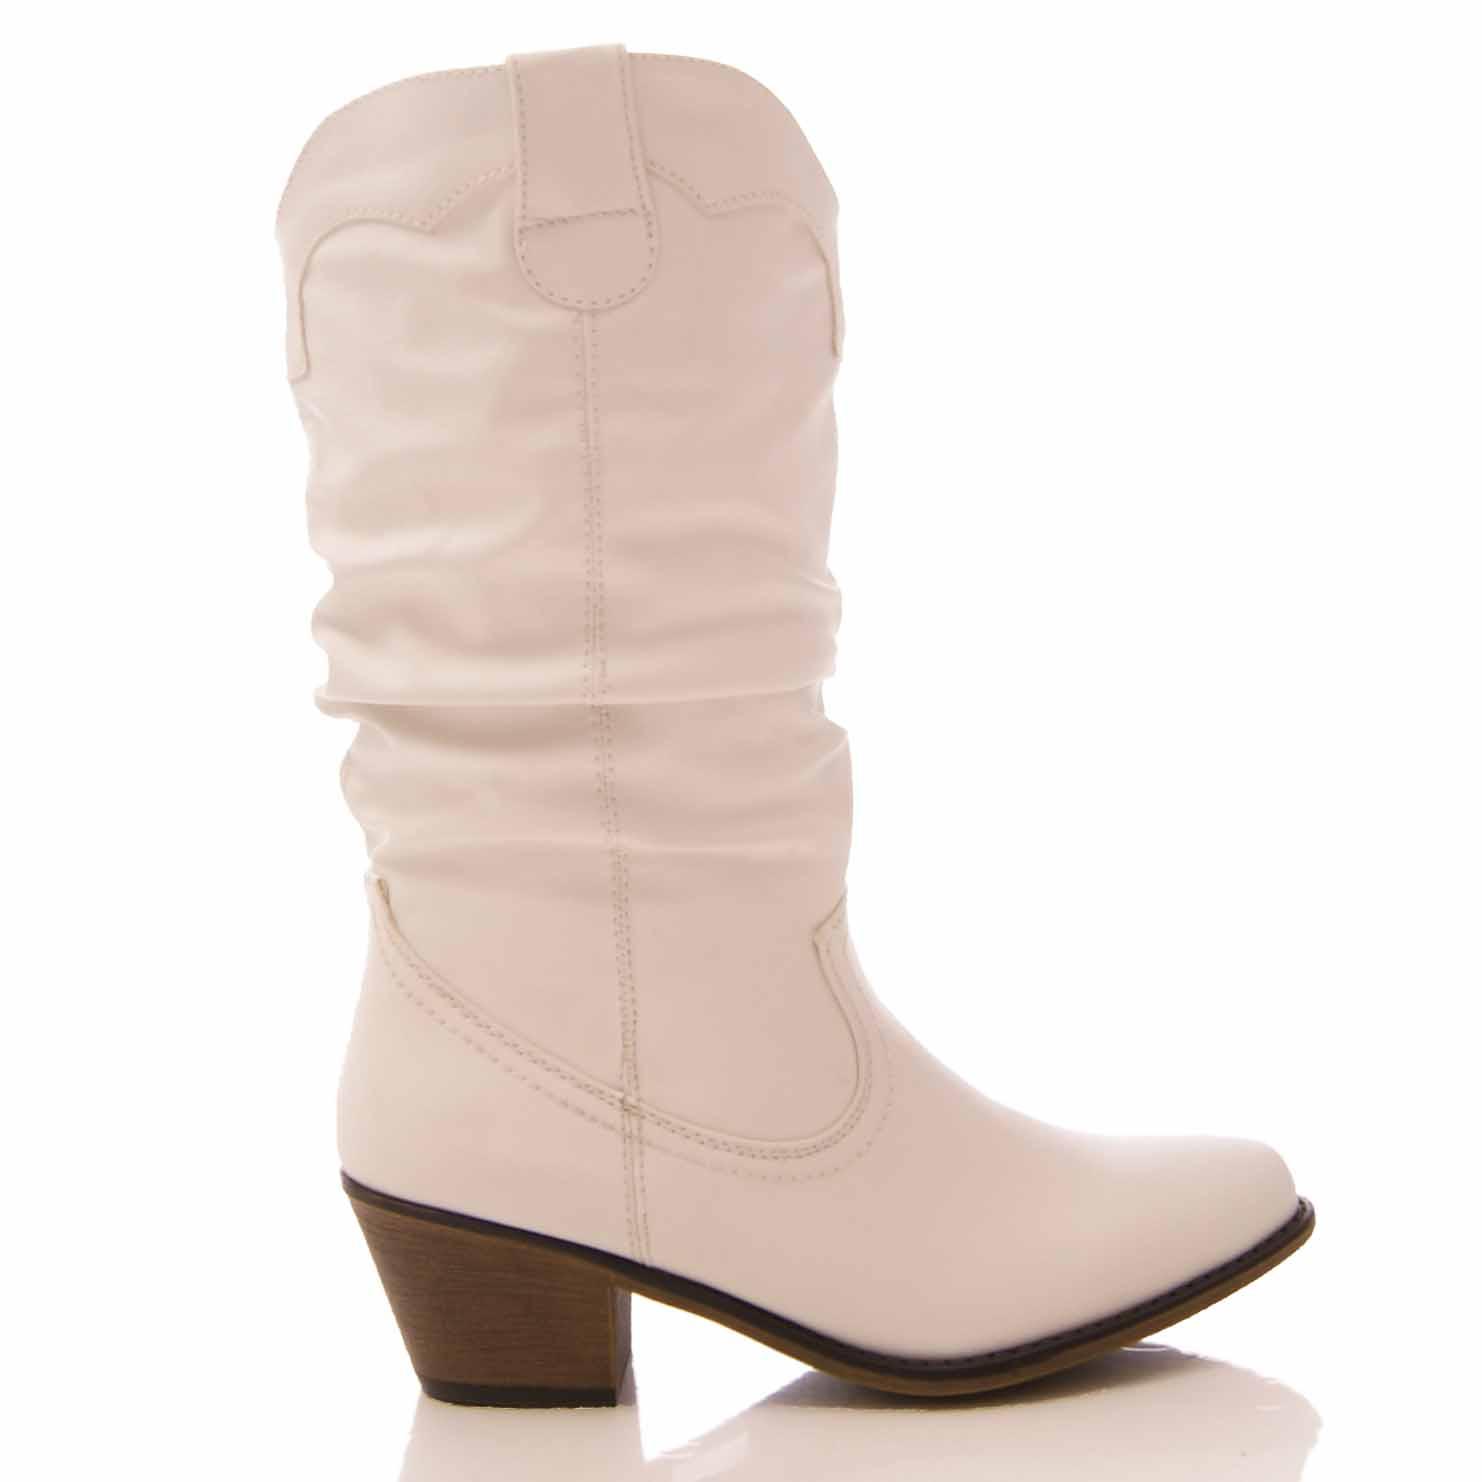 Mesdames Bottes Cowboy Femme Western Mi Mollet Slouch faux cuir casual